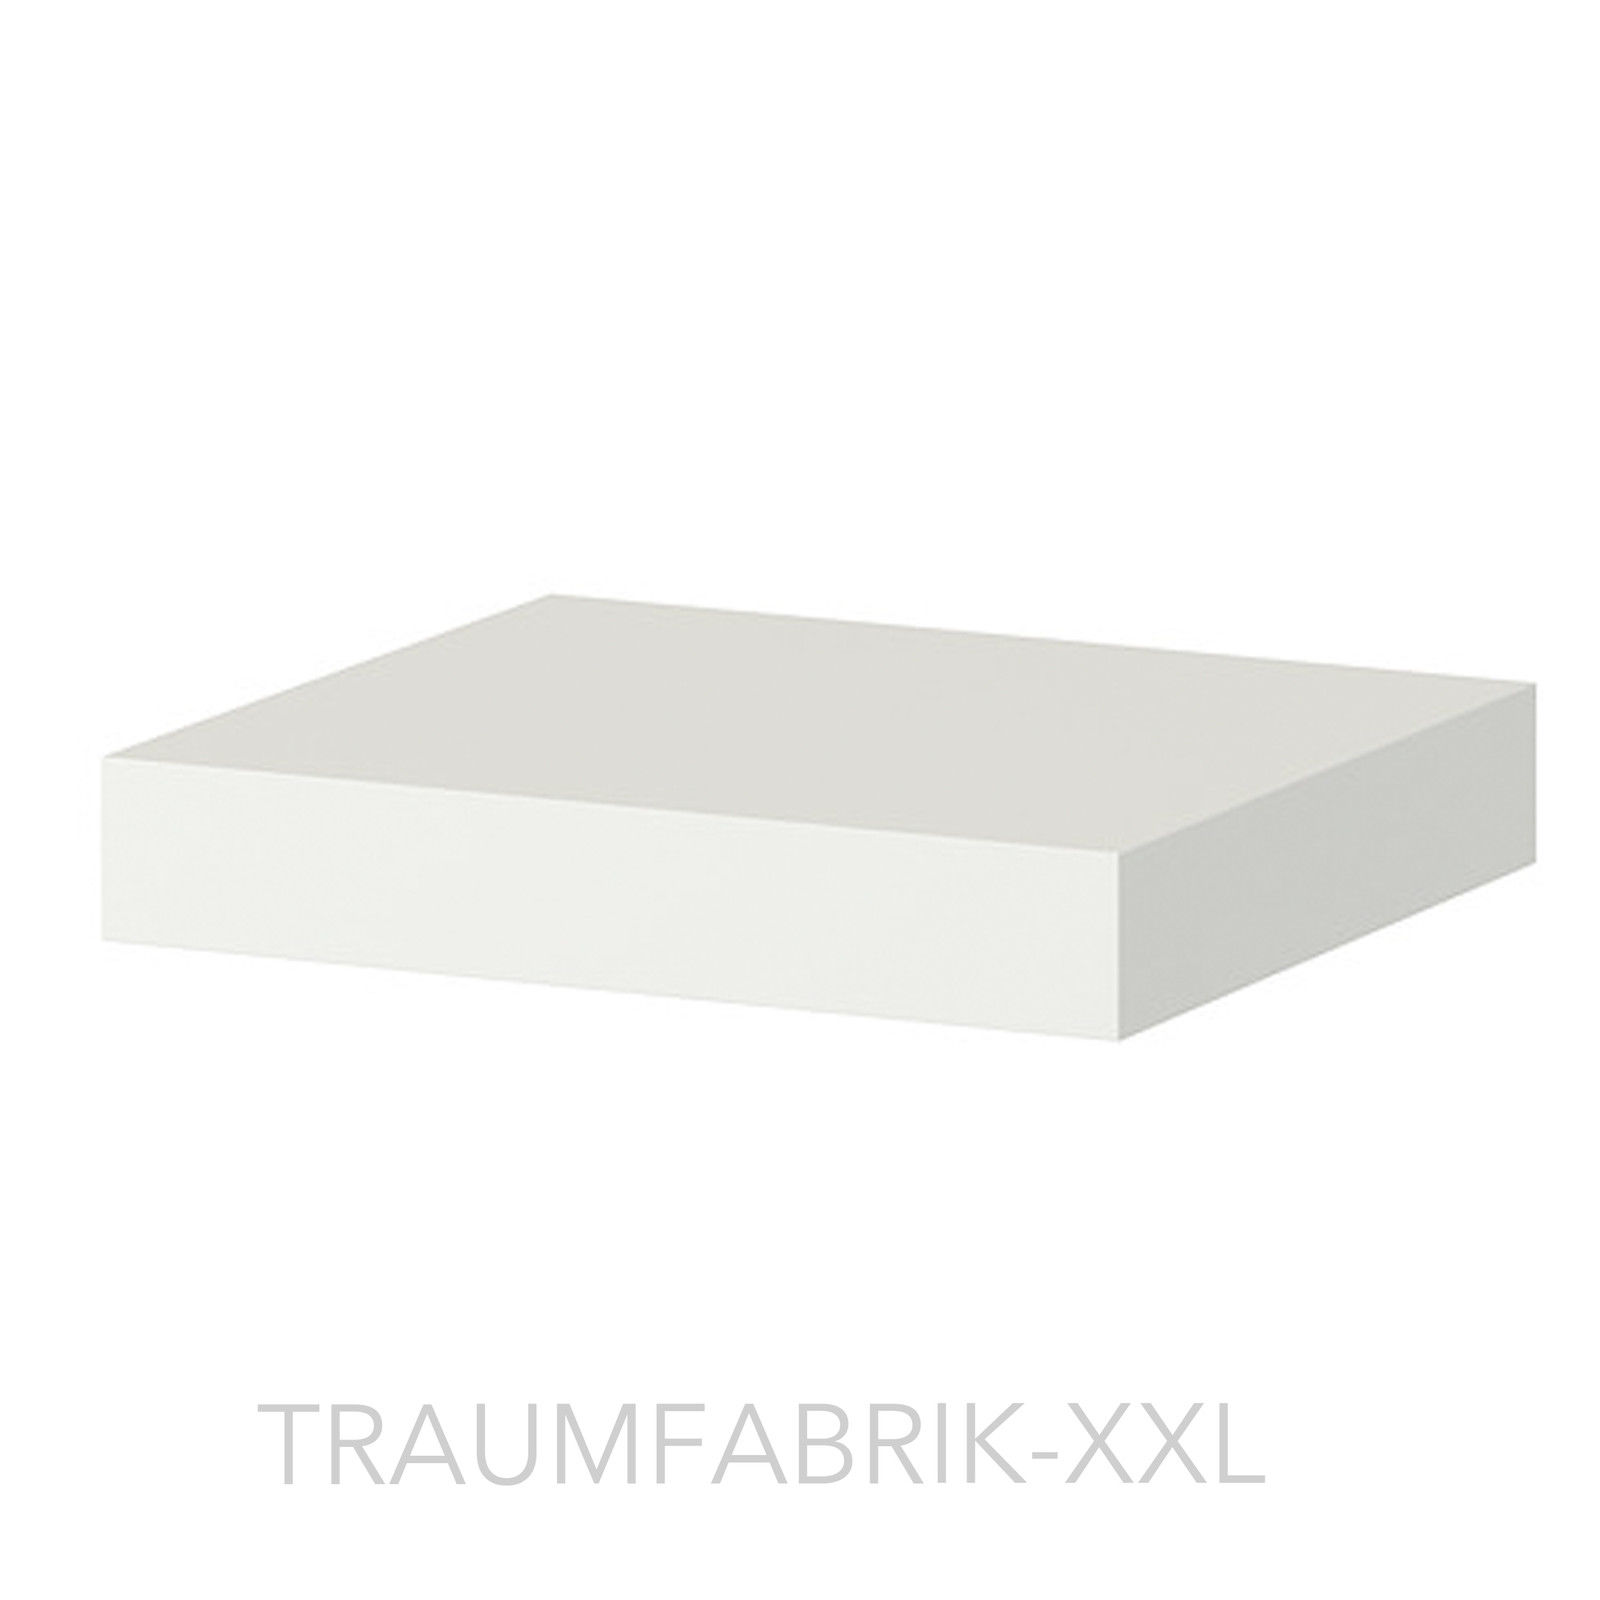 ikea lack wandregal regal in wei wohnzimmerregal k chenregal badregal neu ovp traumfabrik xxl. Black Bedroom Furniture Sets. Home Design Ideas